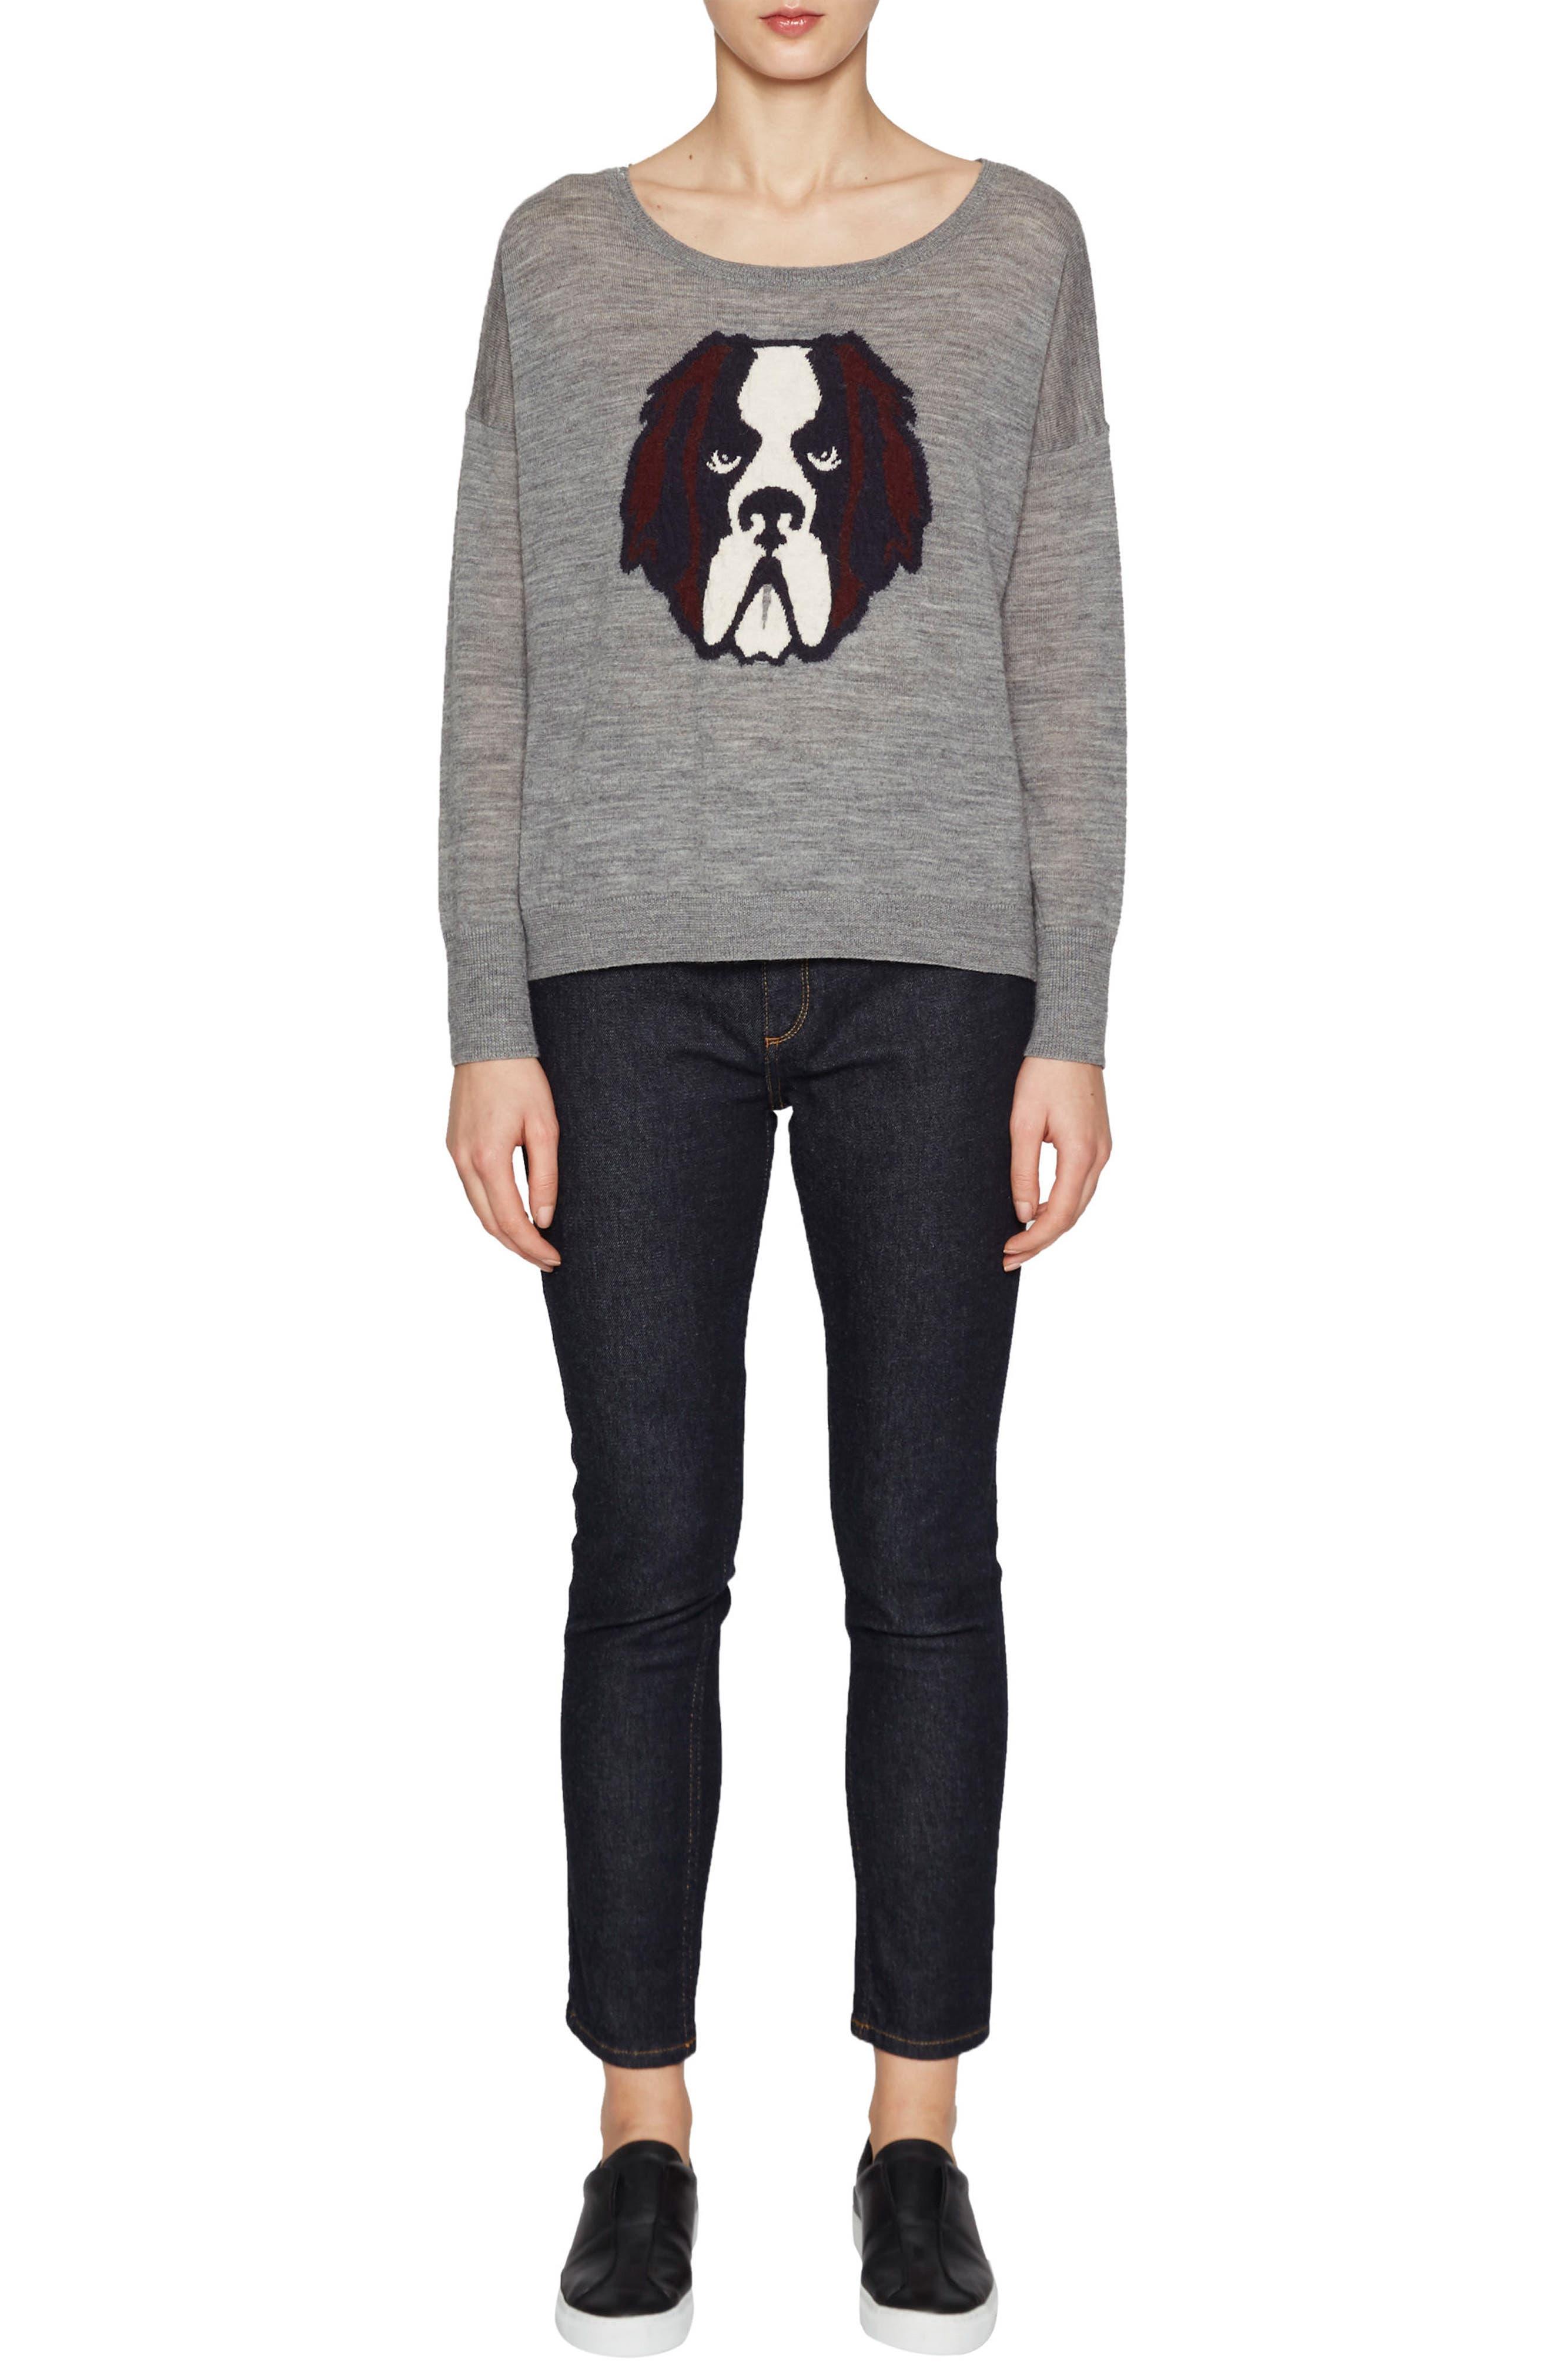 Otis Intarsia Sweater,                             Alternate thumbnail 2, color,                             Mid Grey Multi